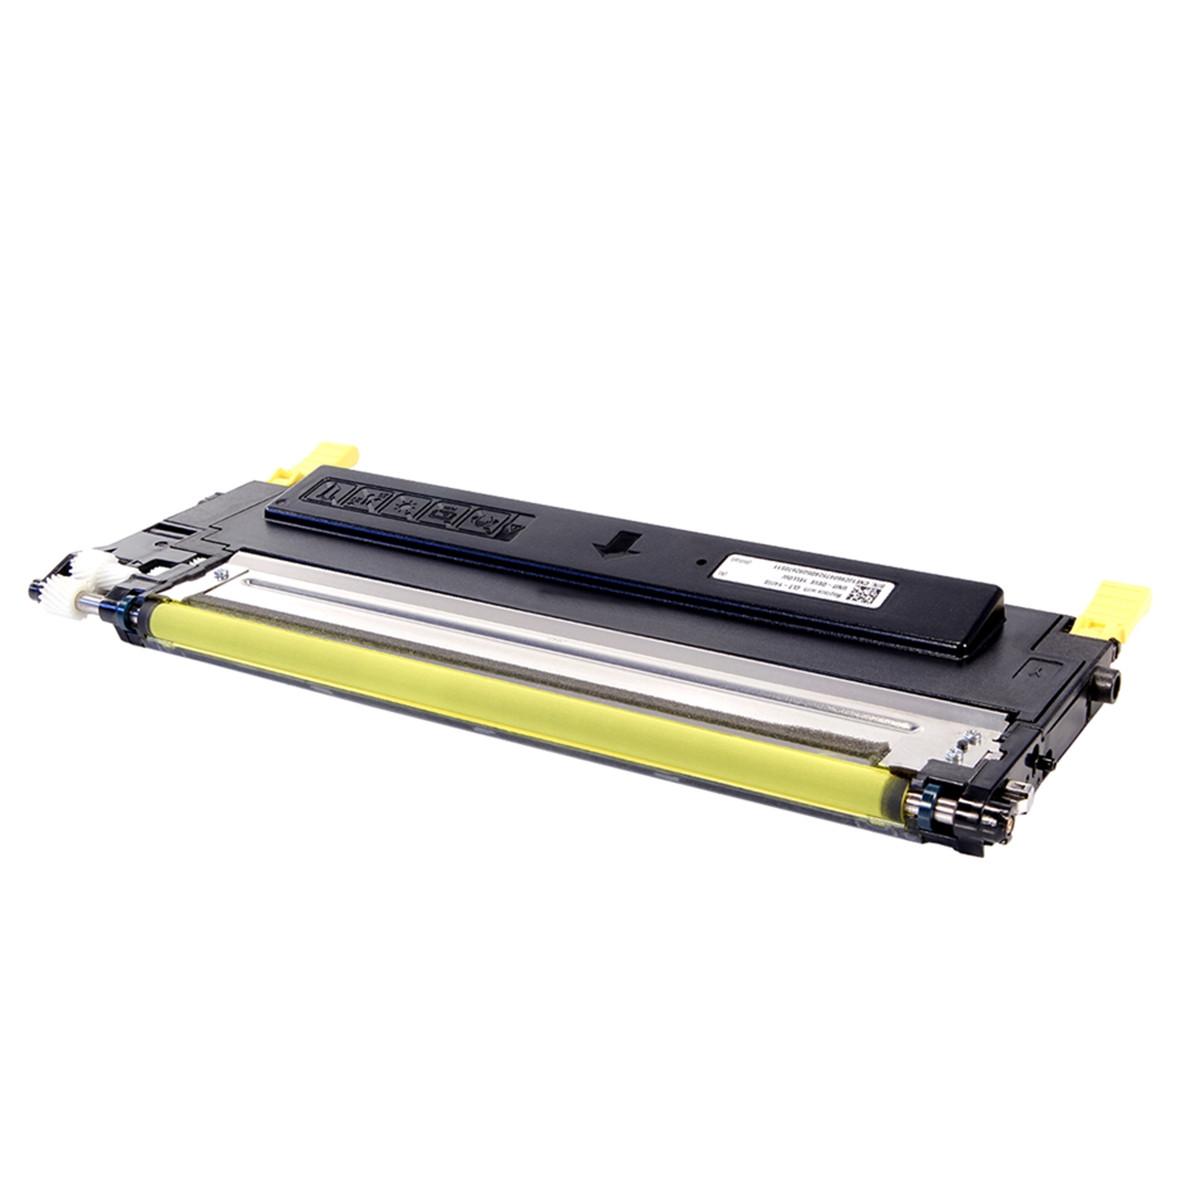 Toner Compatível Samsung CLT-Y409S CLTY409S Amarelo | CLX3170 CLX3175 CLP310 CLP315 | Premium 1k